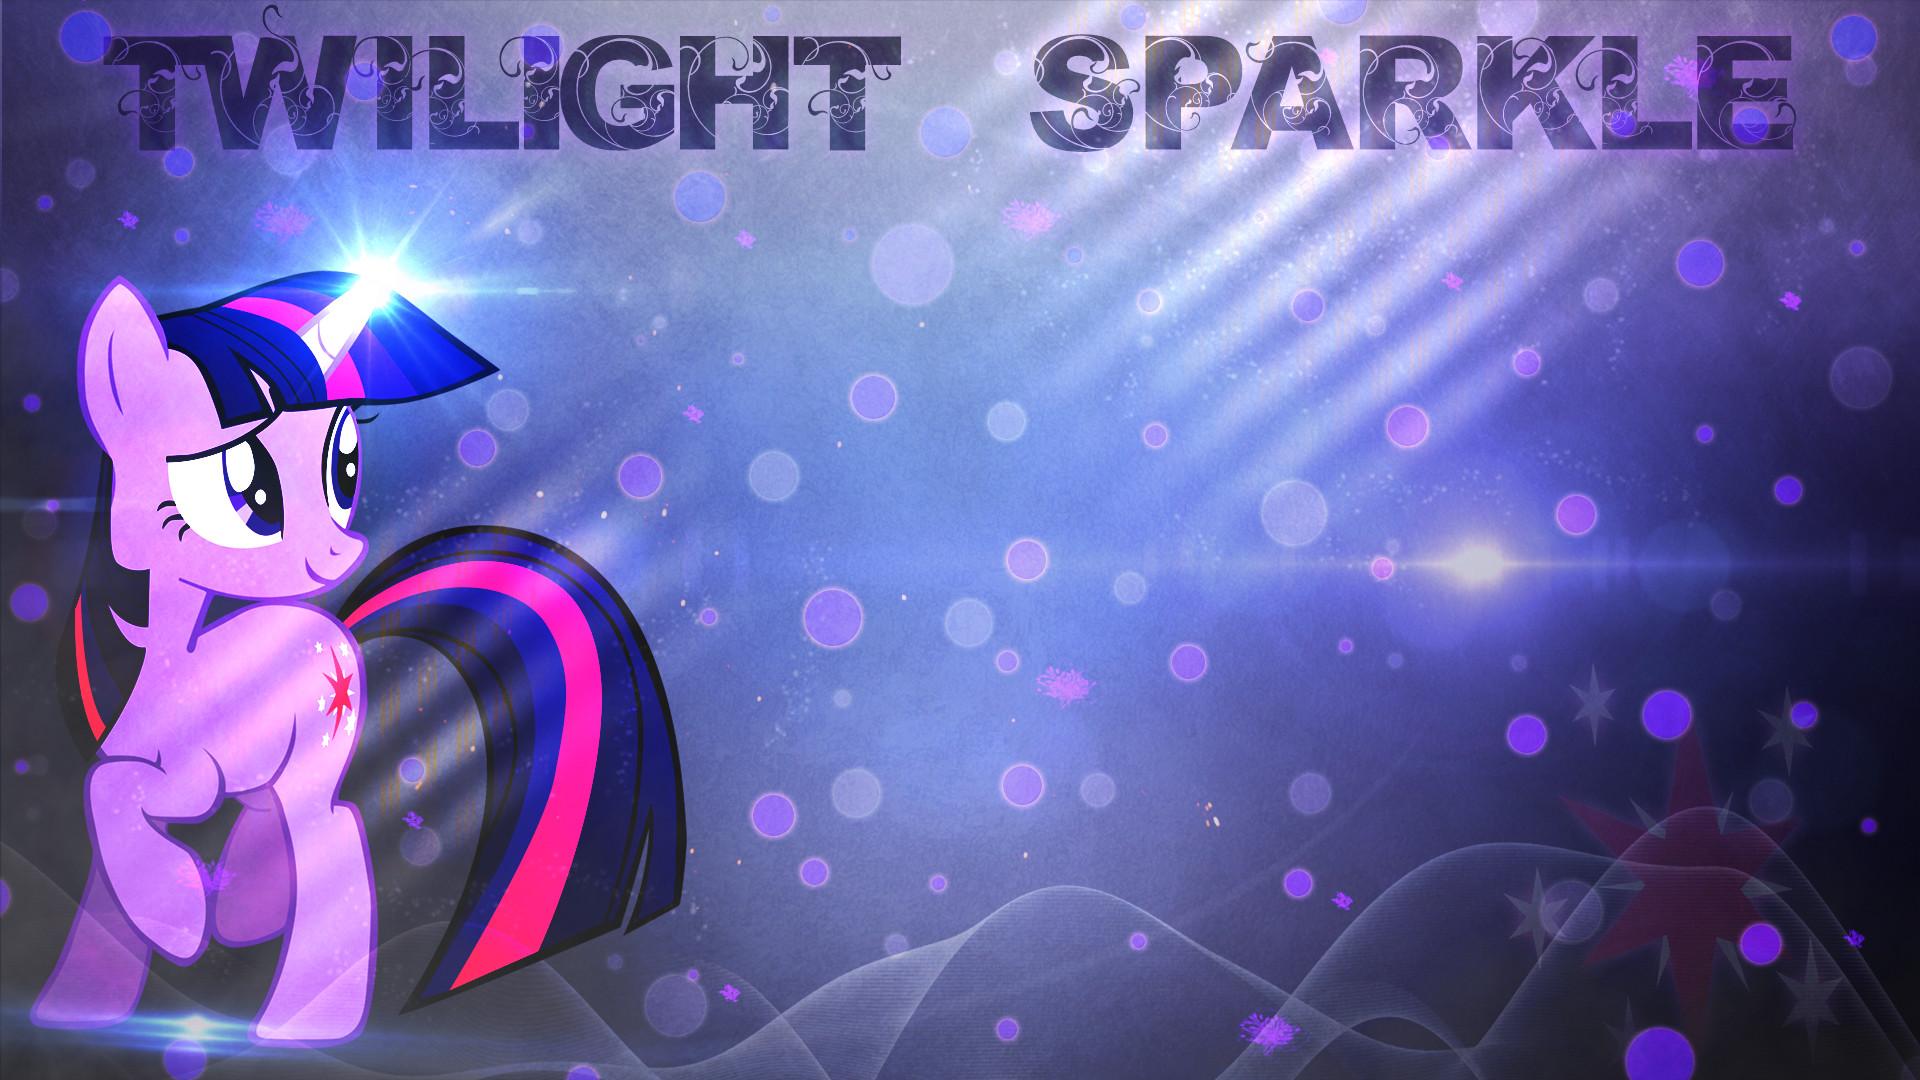 Twilight sparkle wallpaper 85 images 1920x1080 twilight sparkle wallpaper voltagebd Images